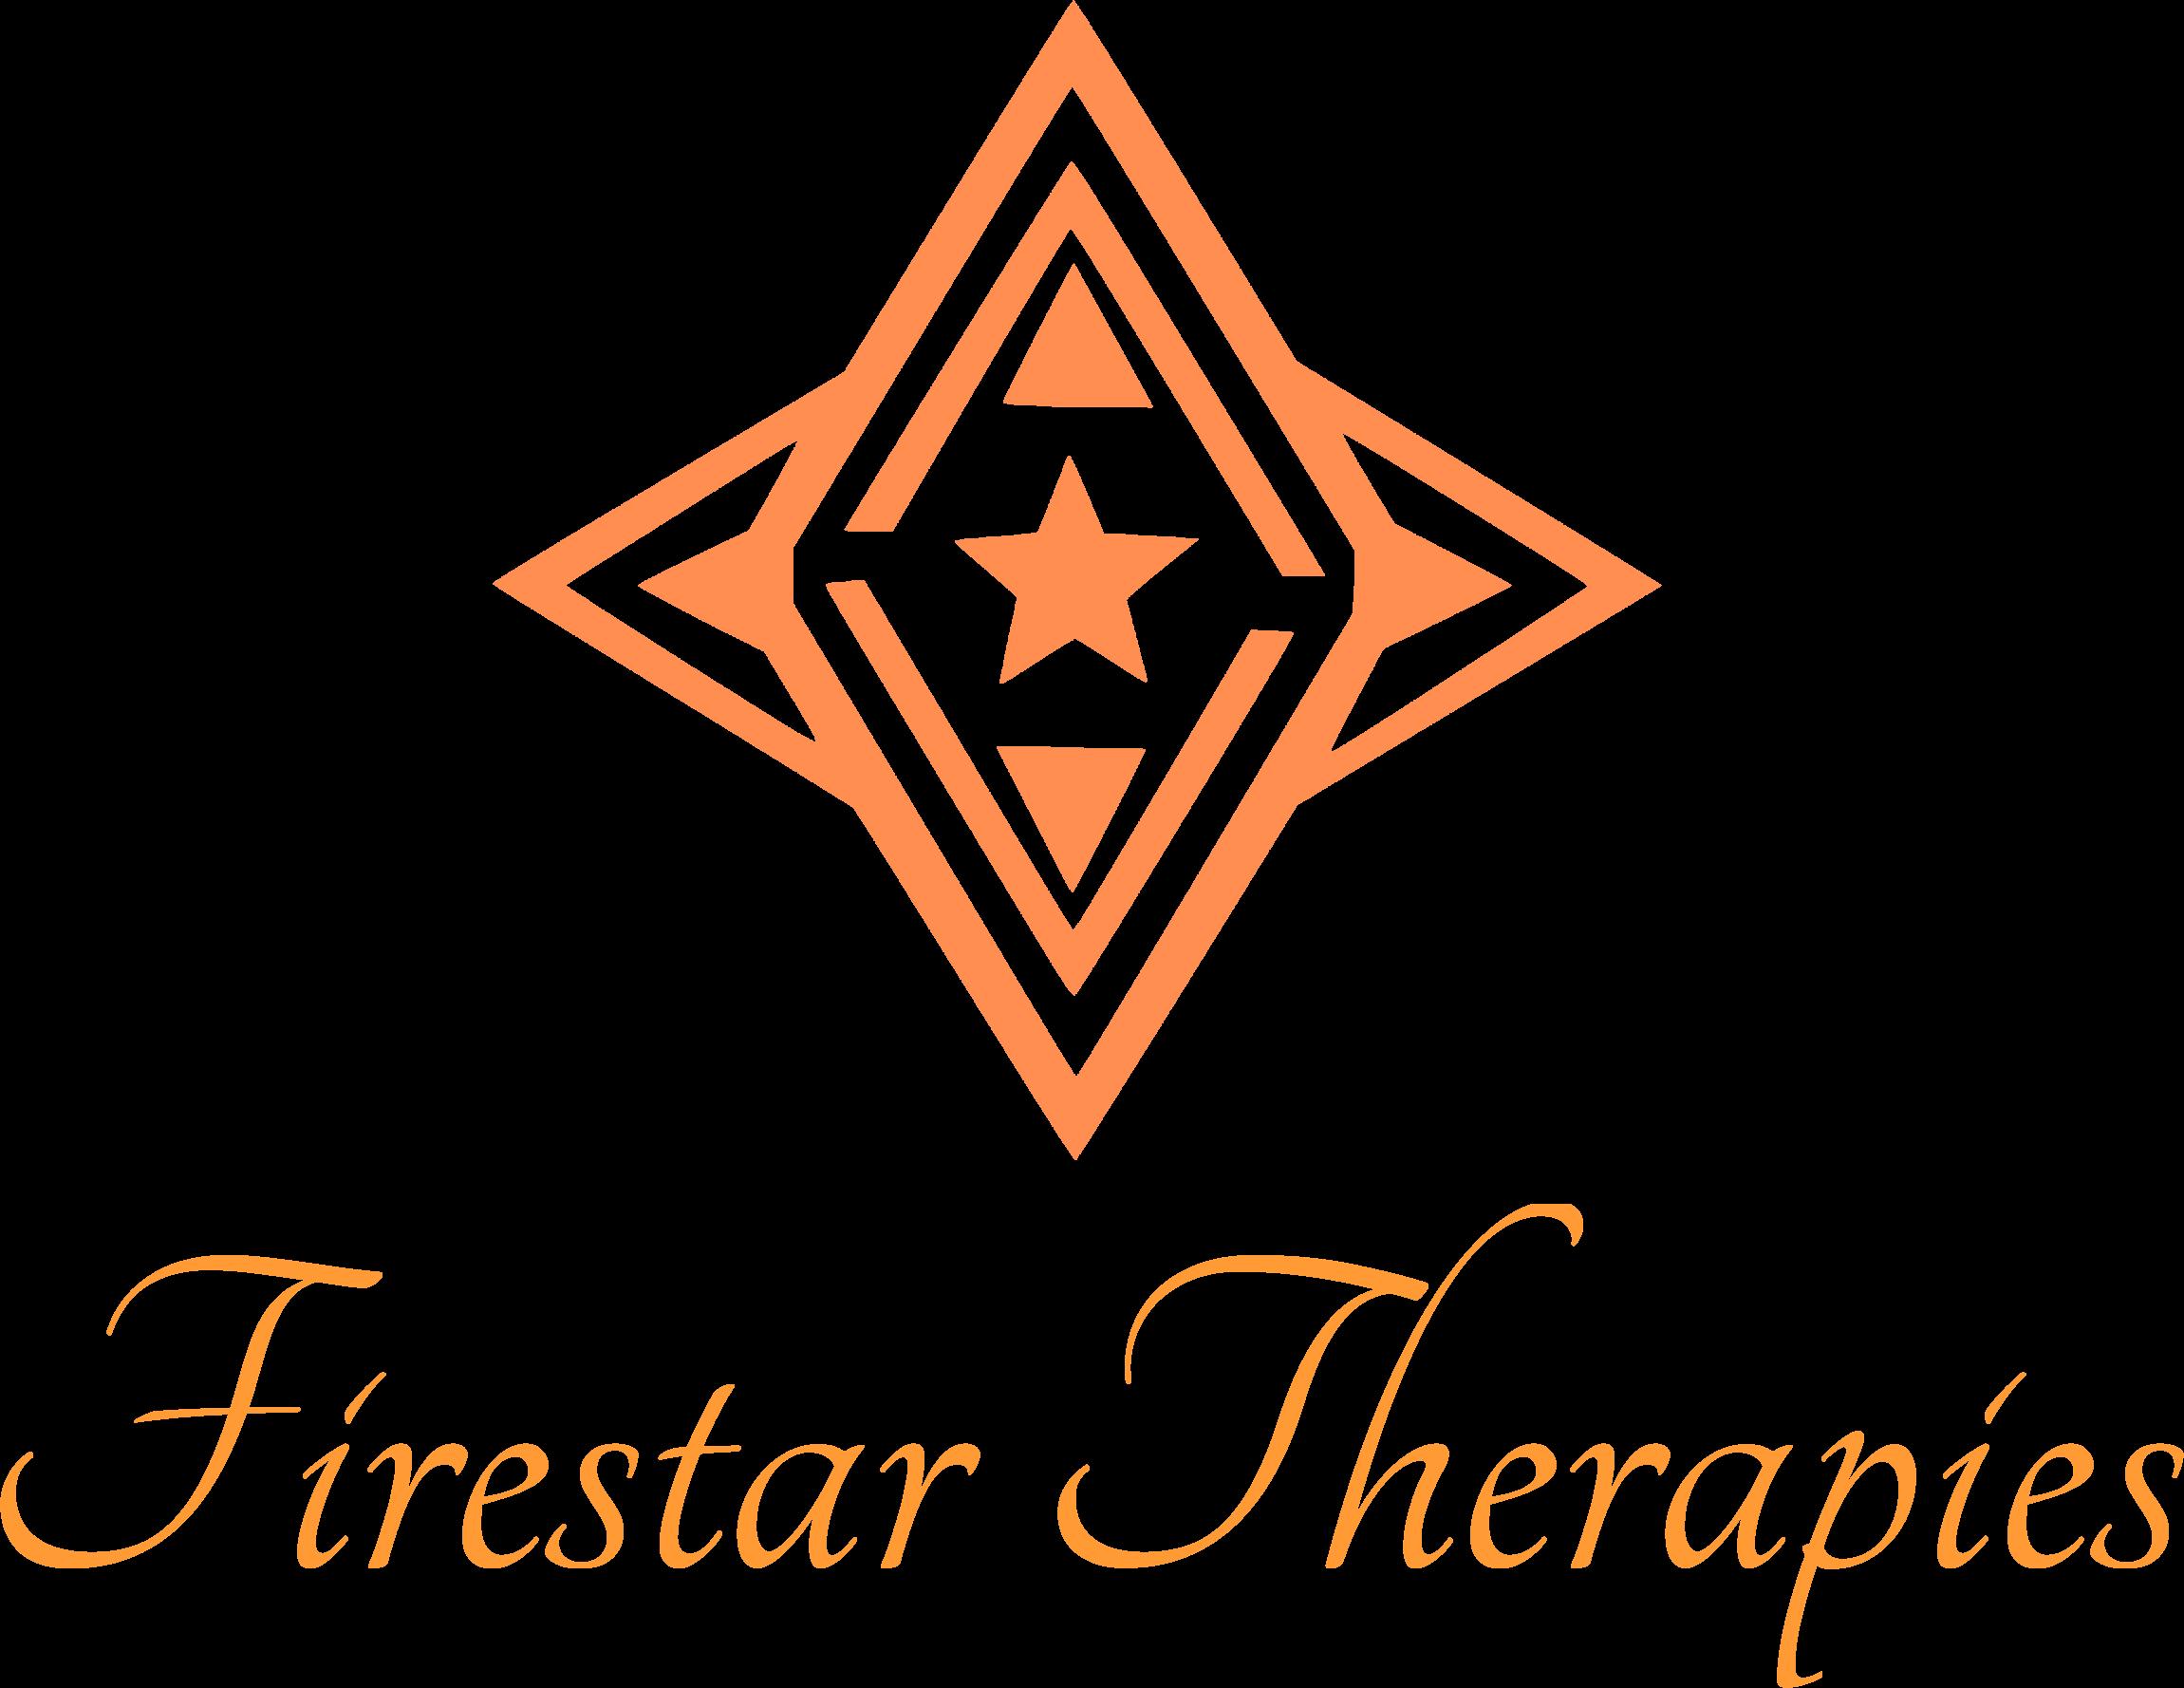 Firestar Therapies logo